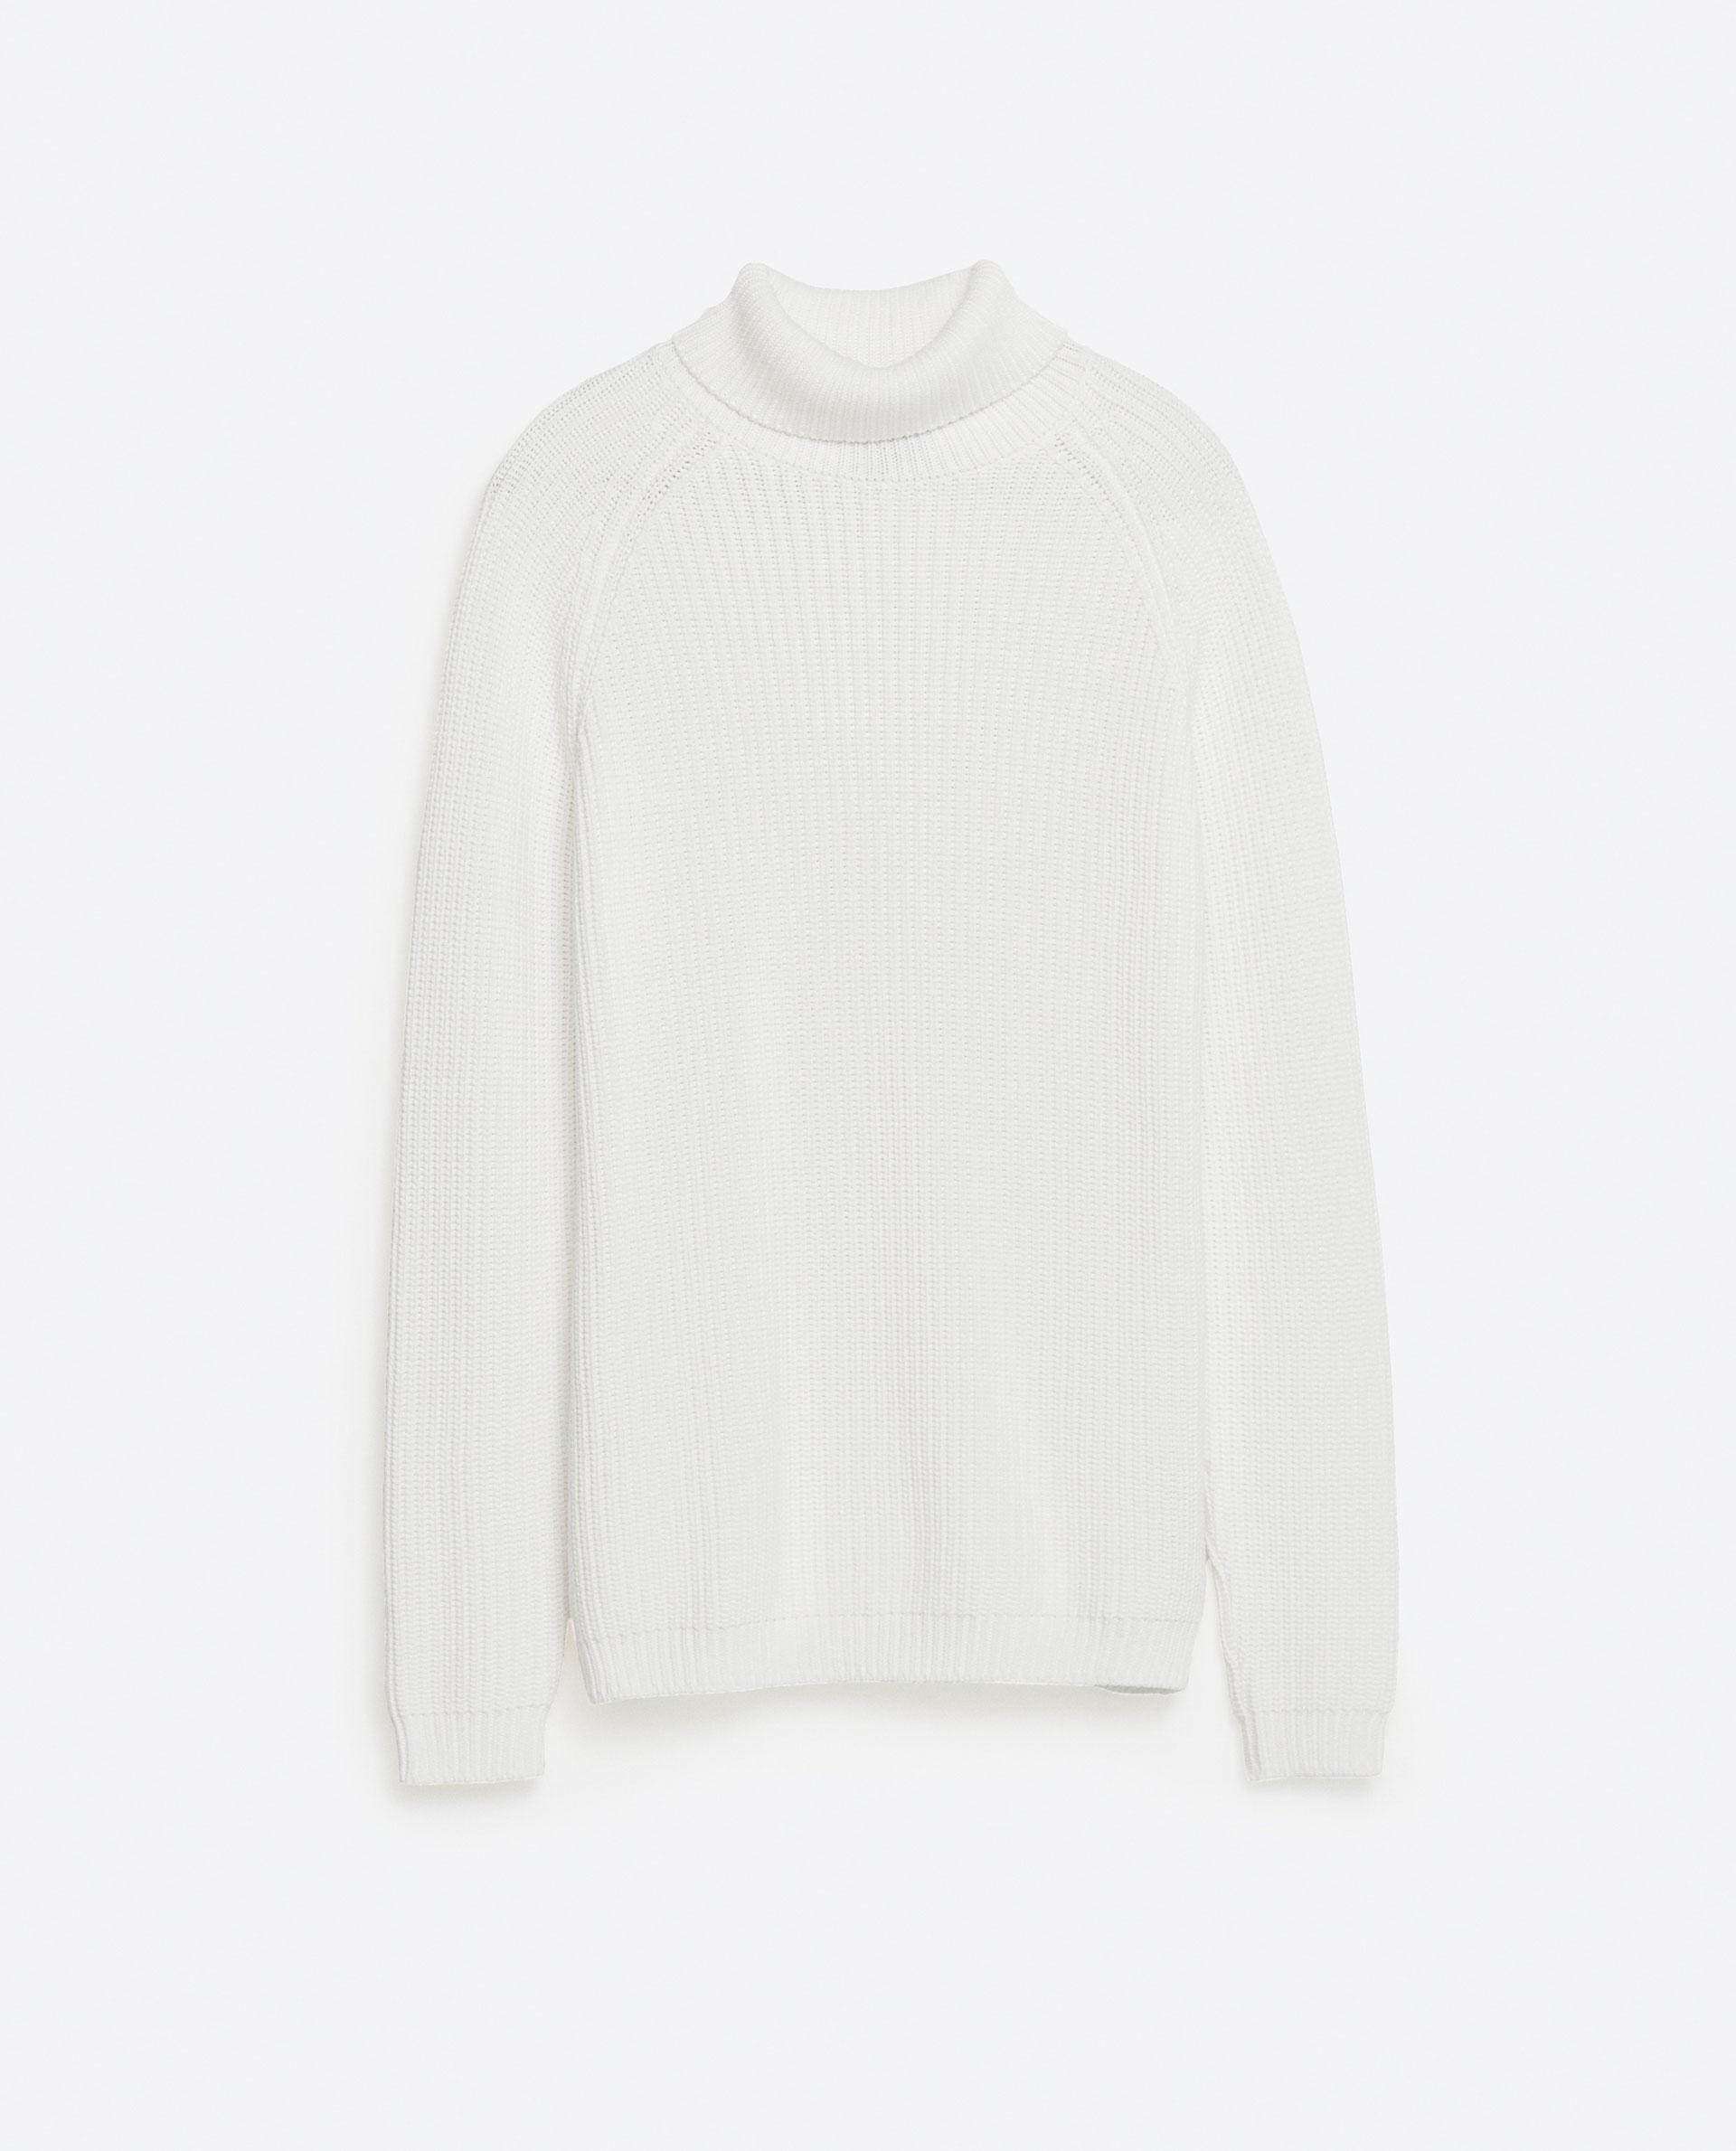 Zara Turtleneck Sweater Mens 41